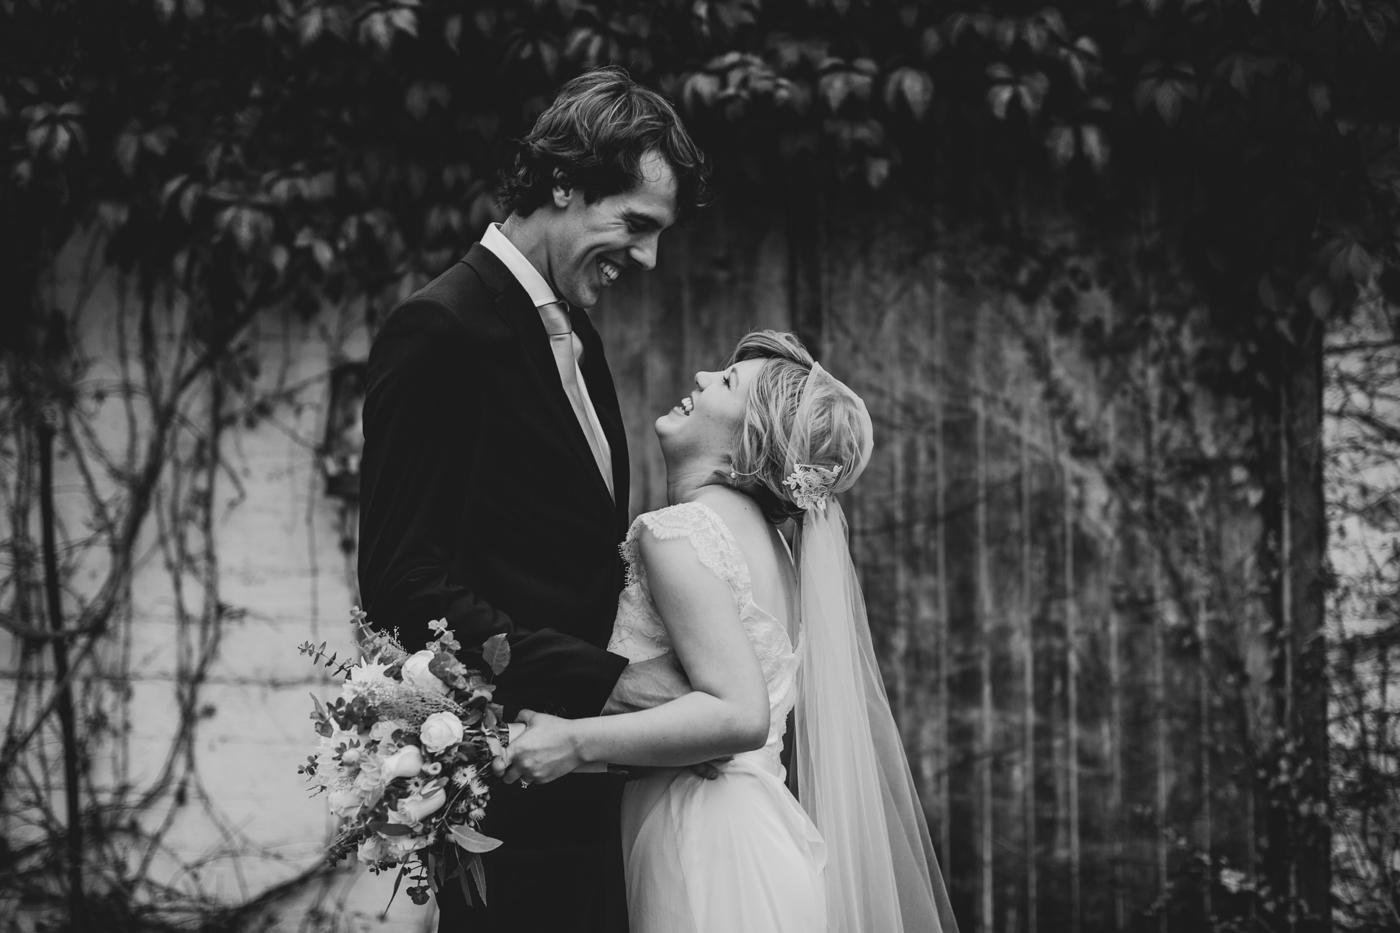 Rachel & Jacob - Willow Farm Berry - South Coast Wedding - Samantha Heather Photography-118.jpg